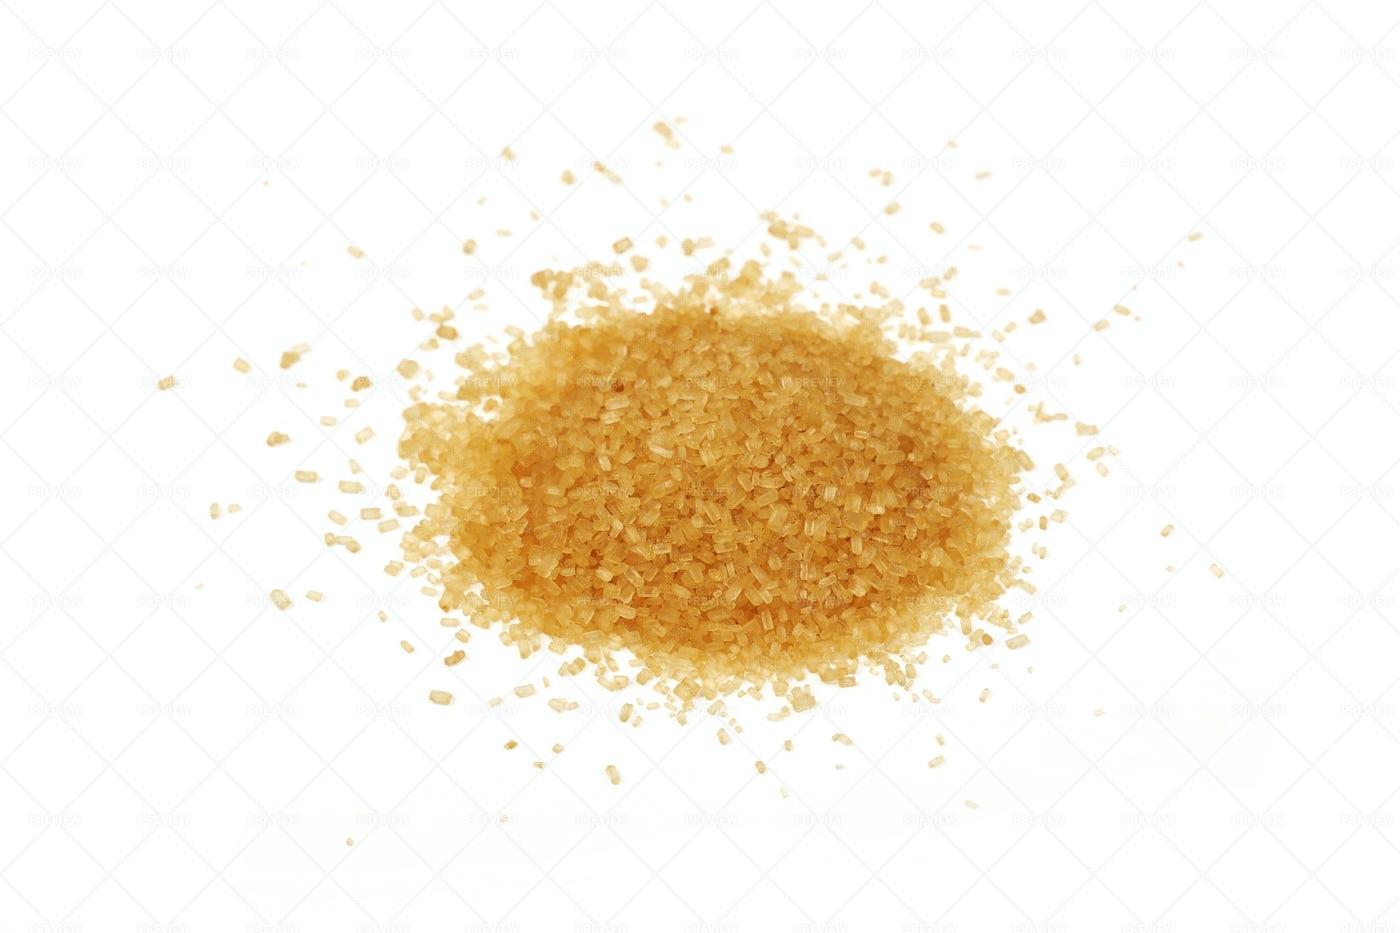 Pinch Of Brown Sugar: Stock Photos